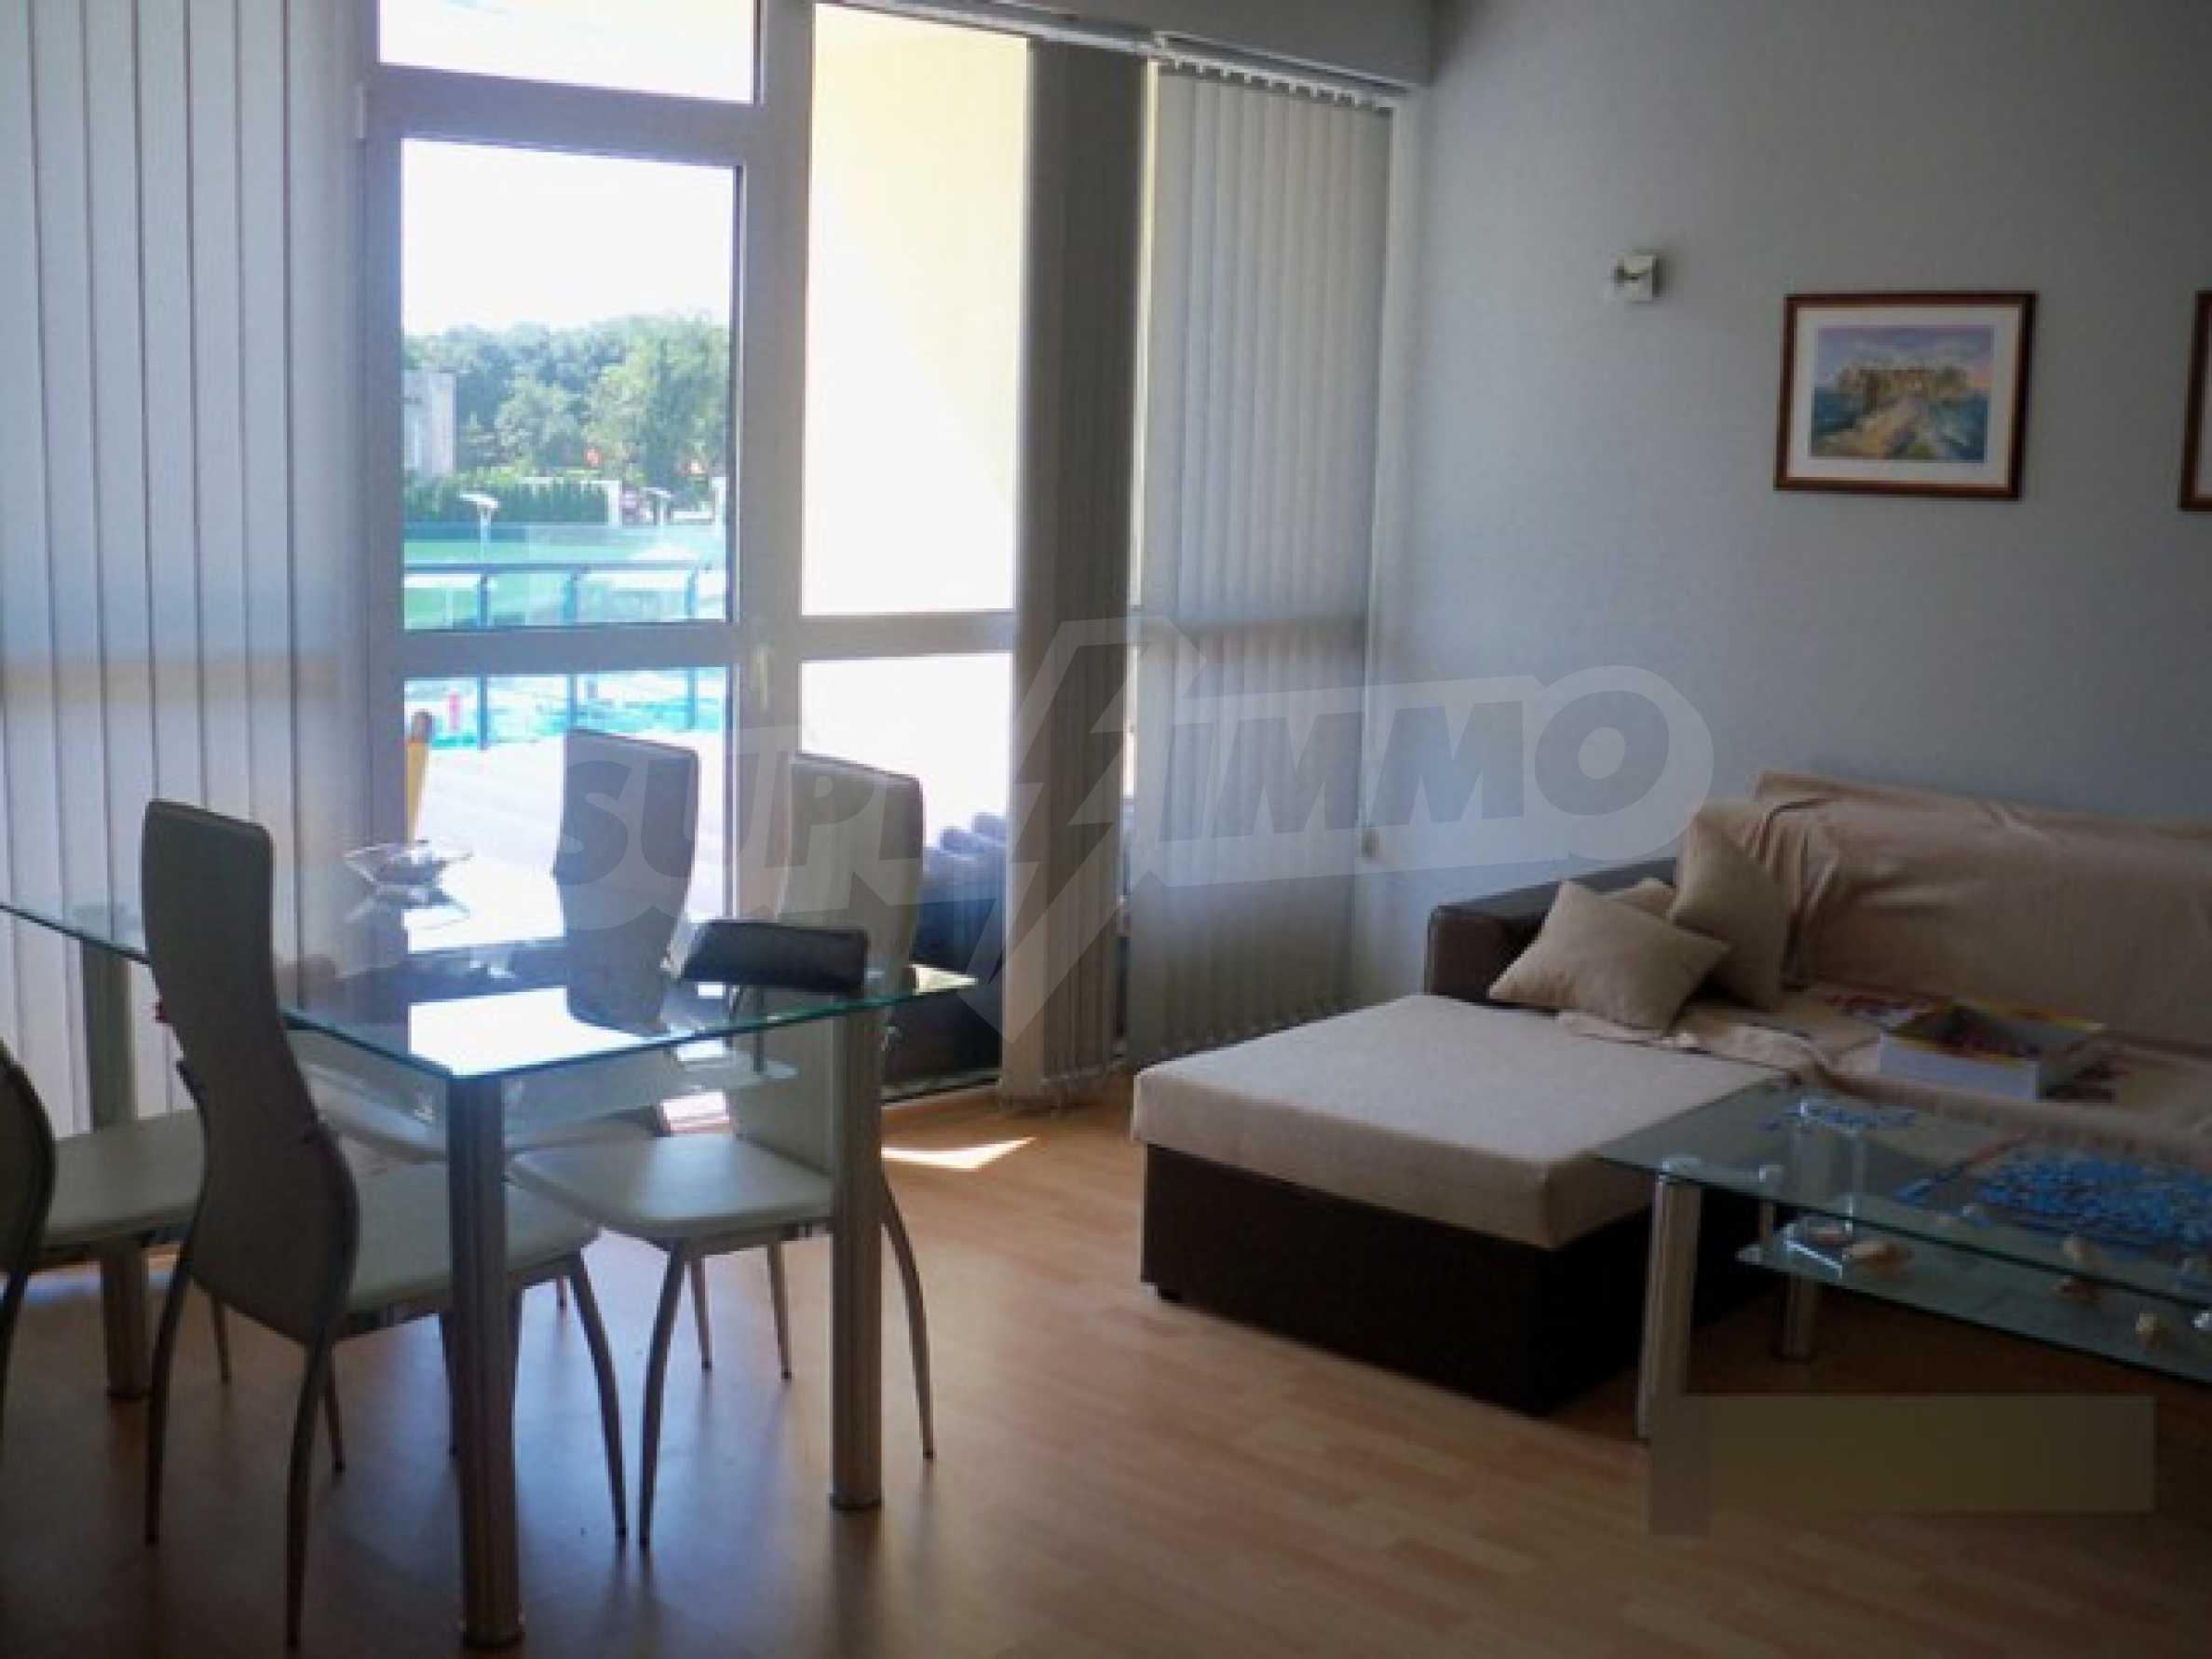 Тристаен апартамент за продажба в Поморие 7